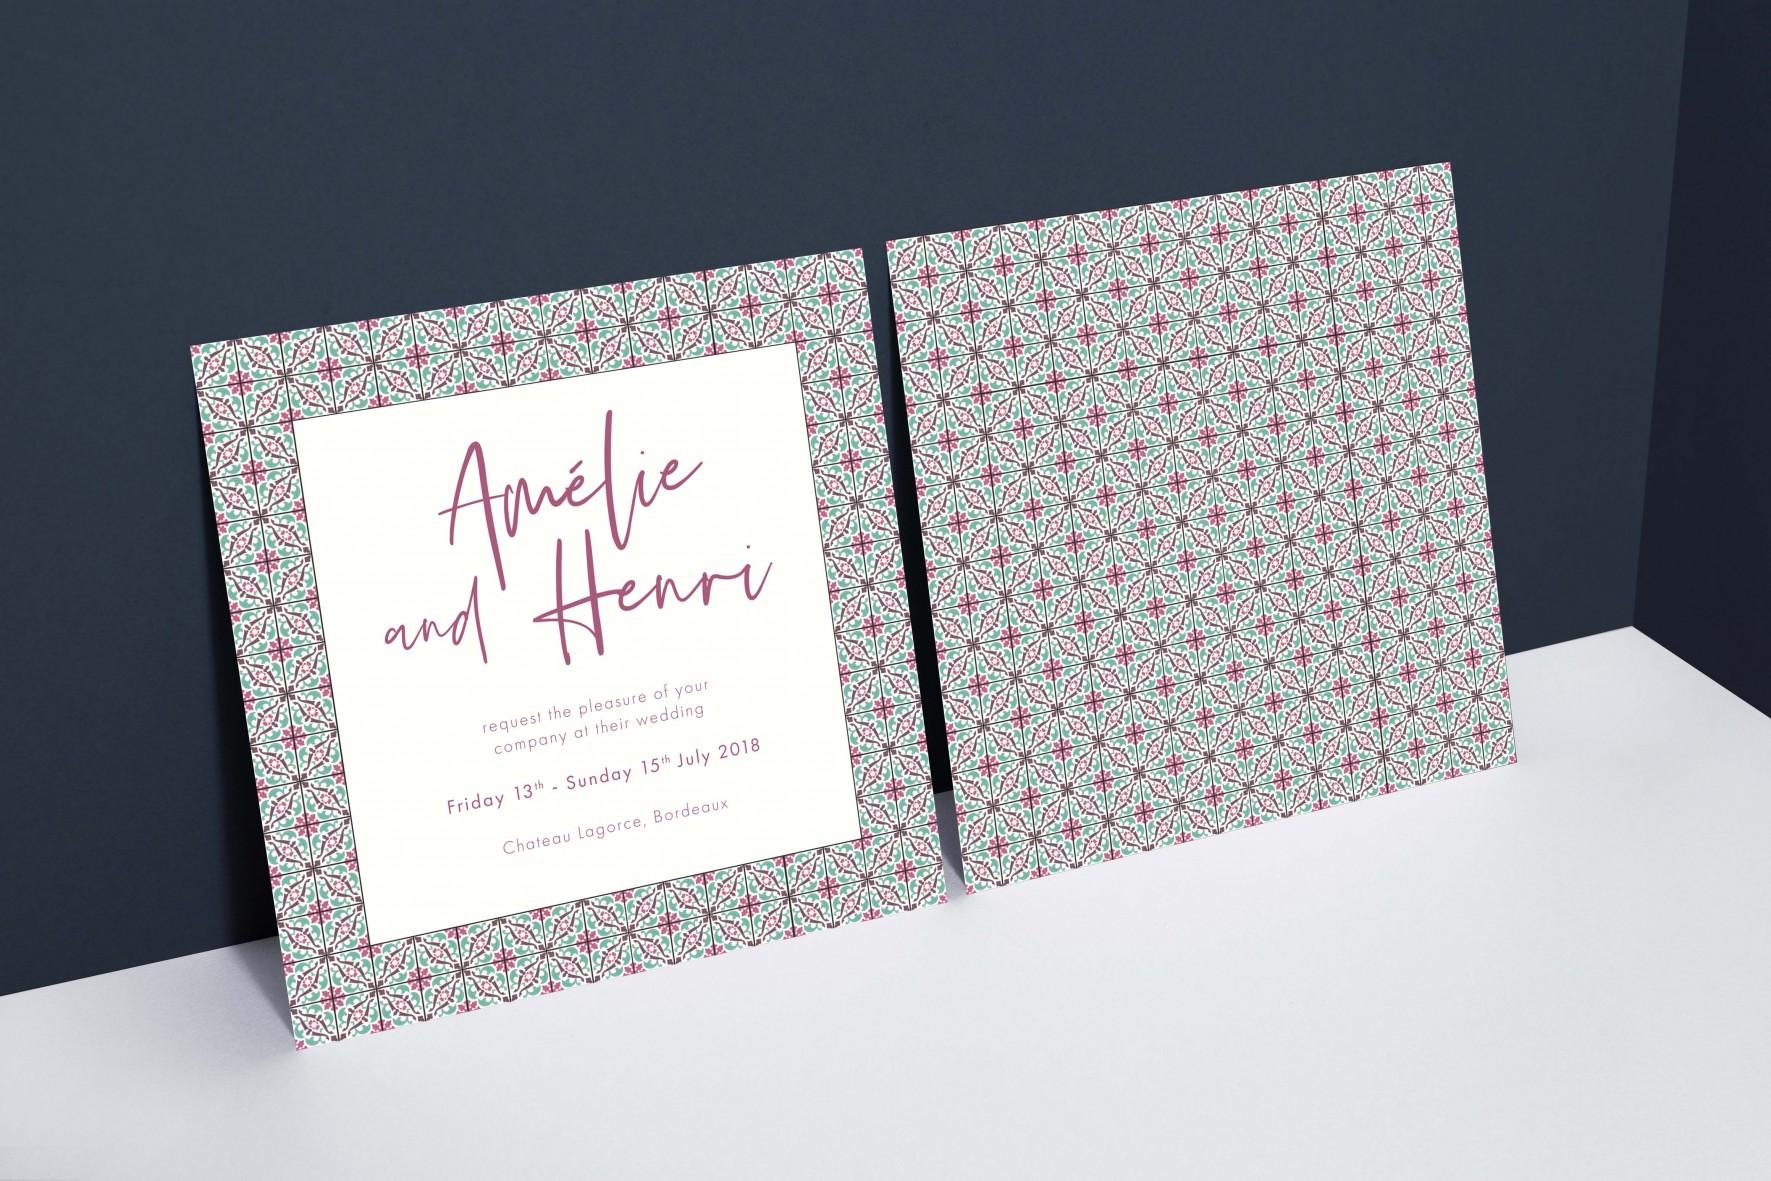 Spanish tile pattern watercolour wedding invitation - stationery by www.rosepaperscissors.com